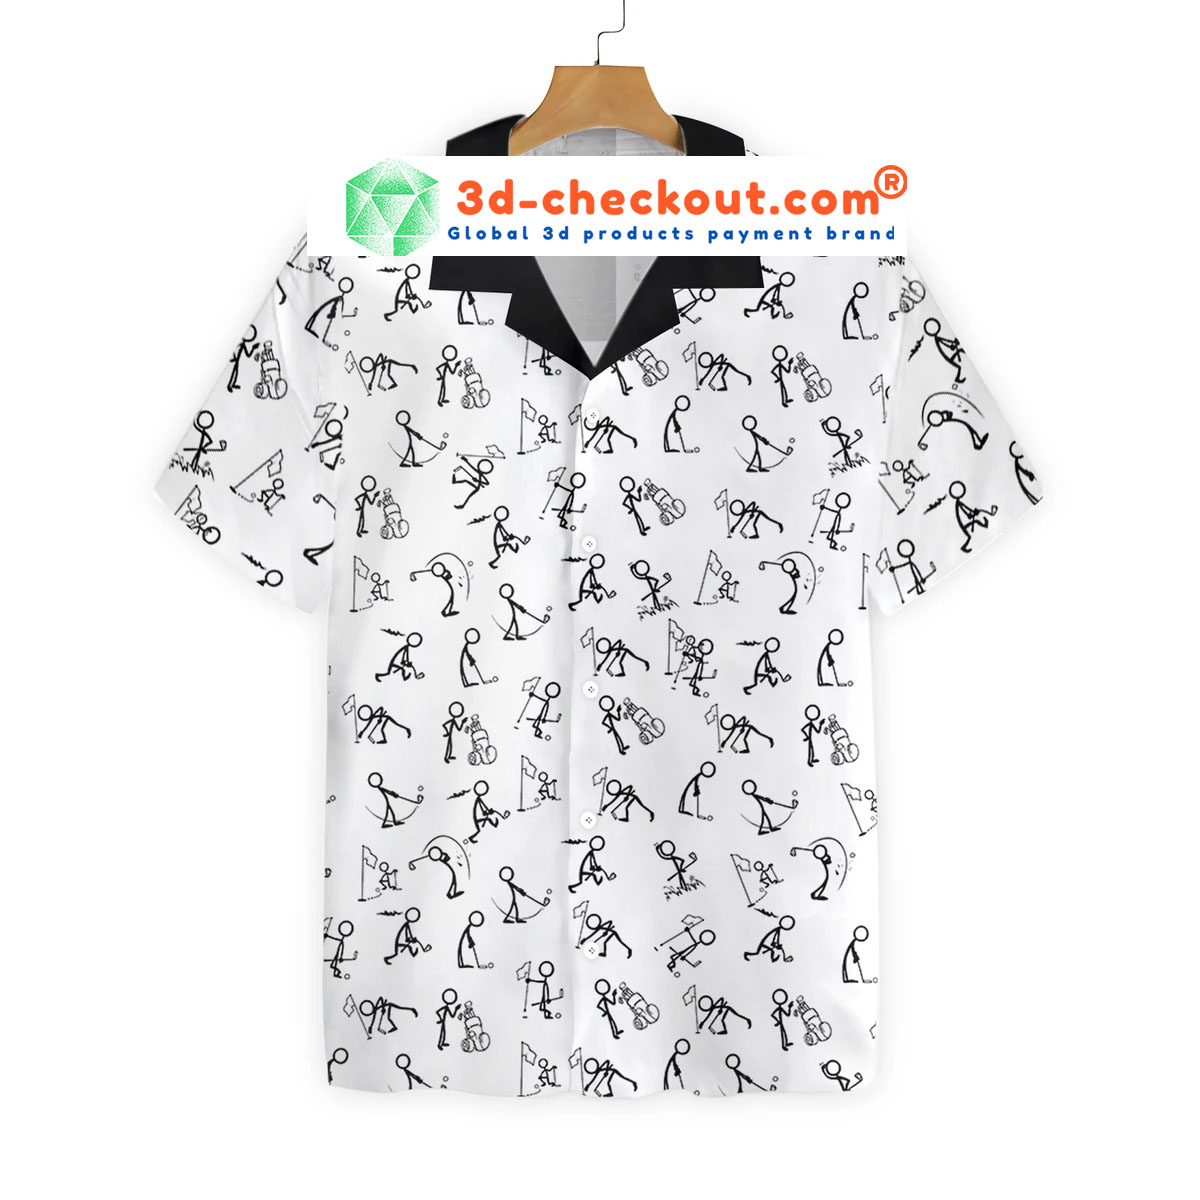 Stickfigures playing golf hawaiian shirt2